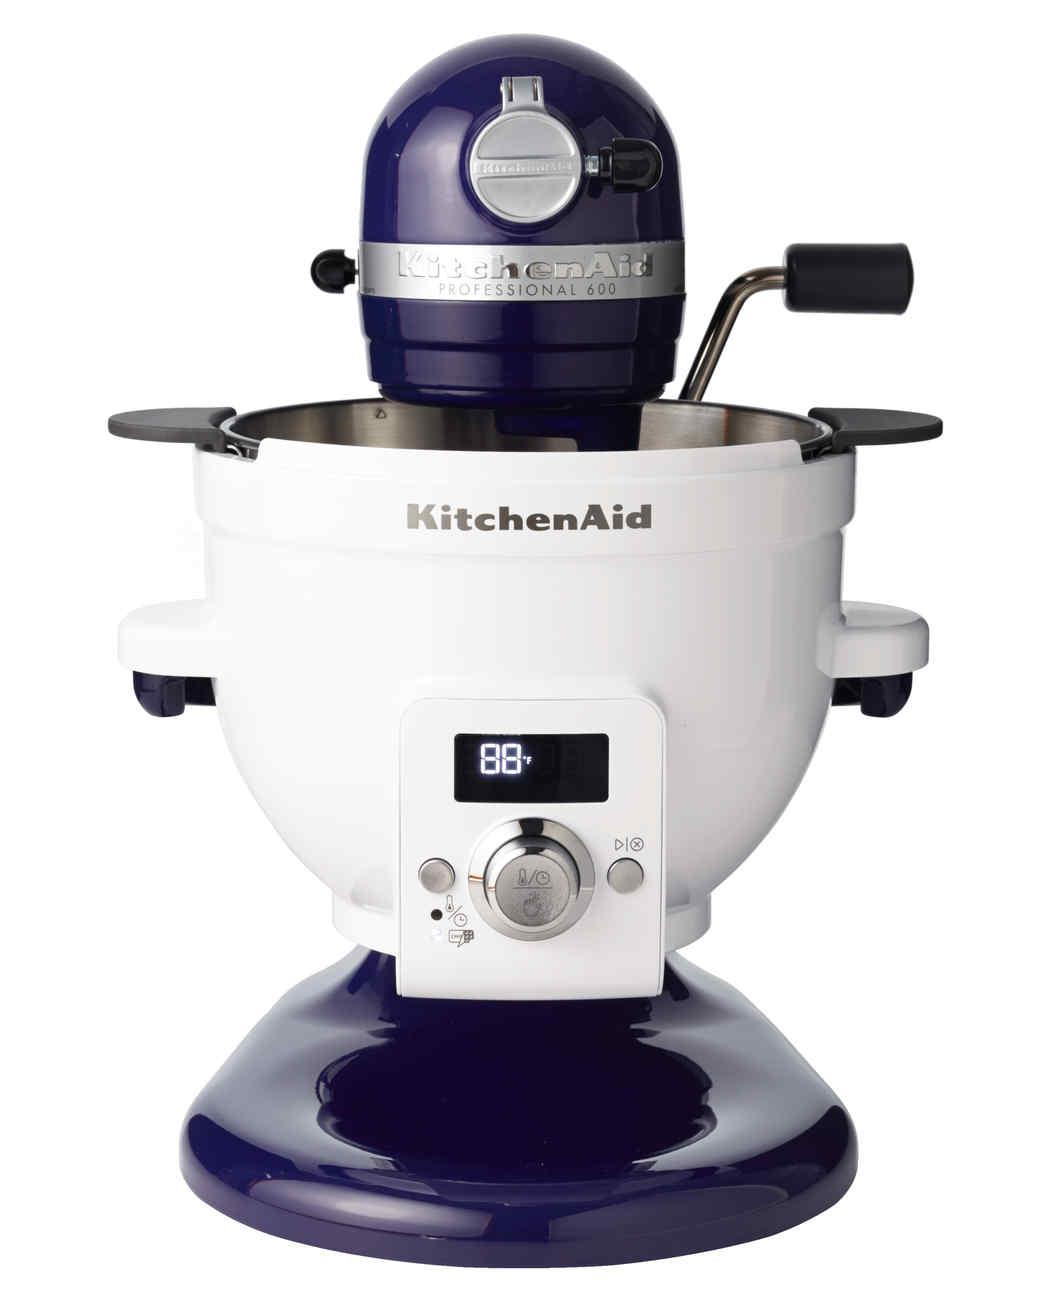 kitchen-aid-mixing-bowl-041-d112321.jpg